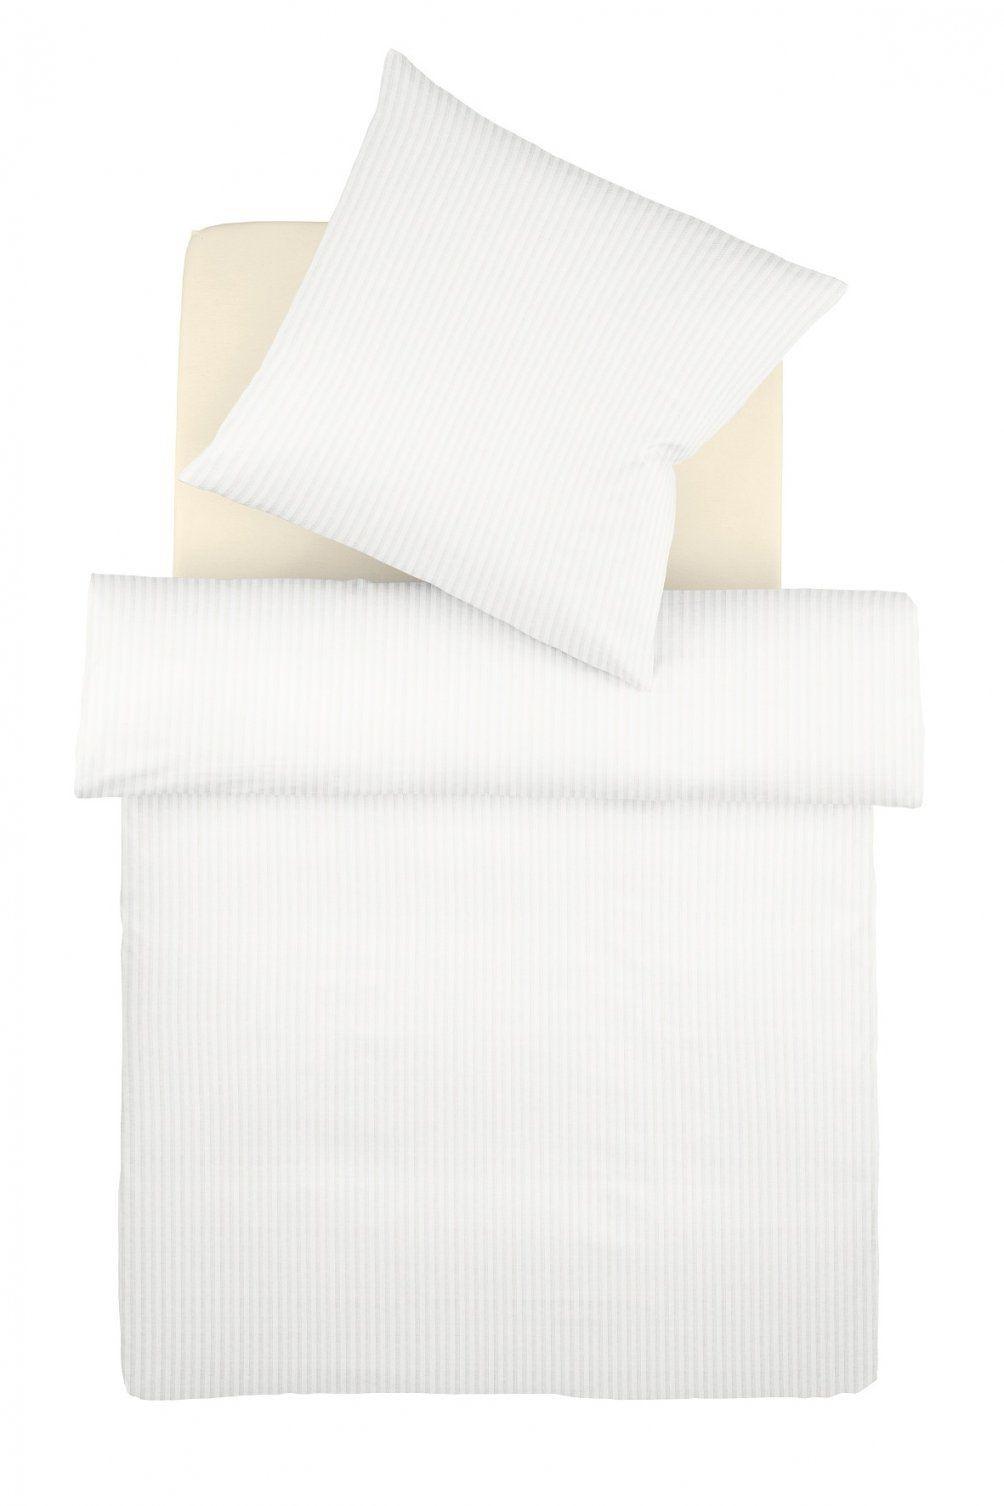 bettw sche 155x200 jersey haus design ideen. Black Bedroom Furniture Sets. Home Design Ideas